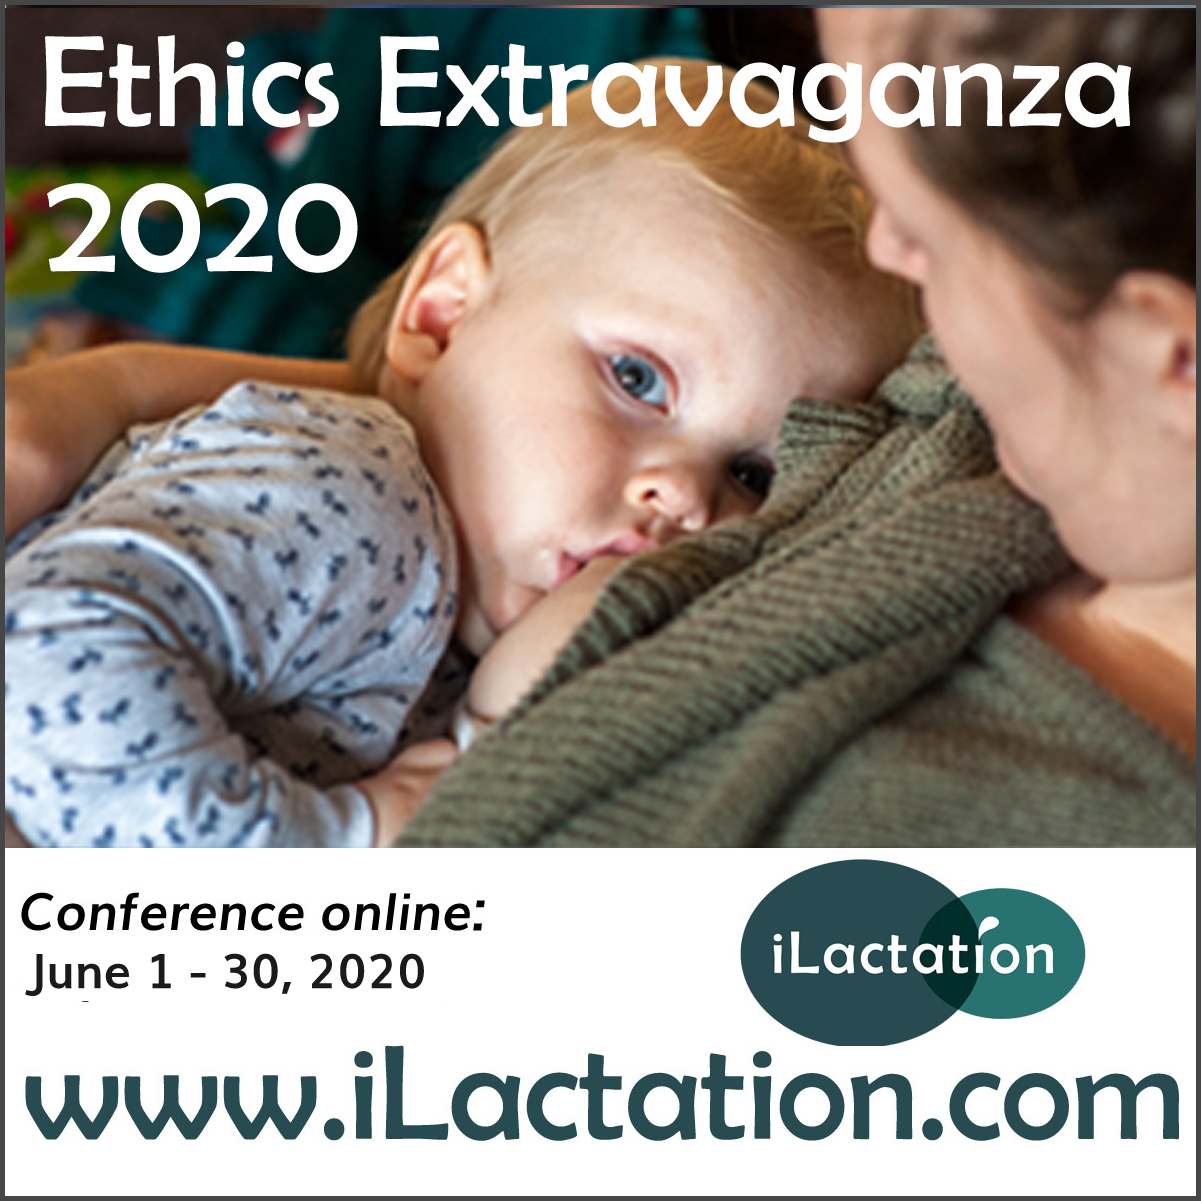 Insta picture - Ethics Extravaganza 2020